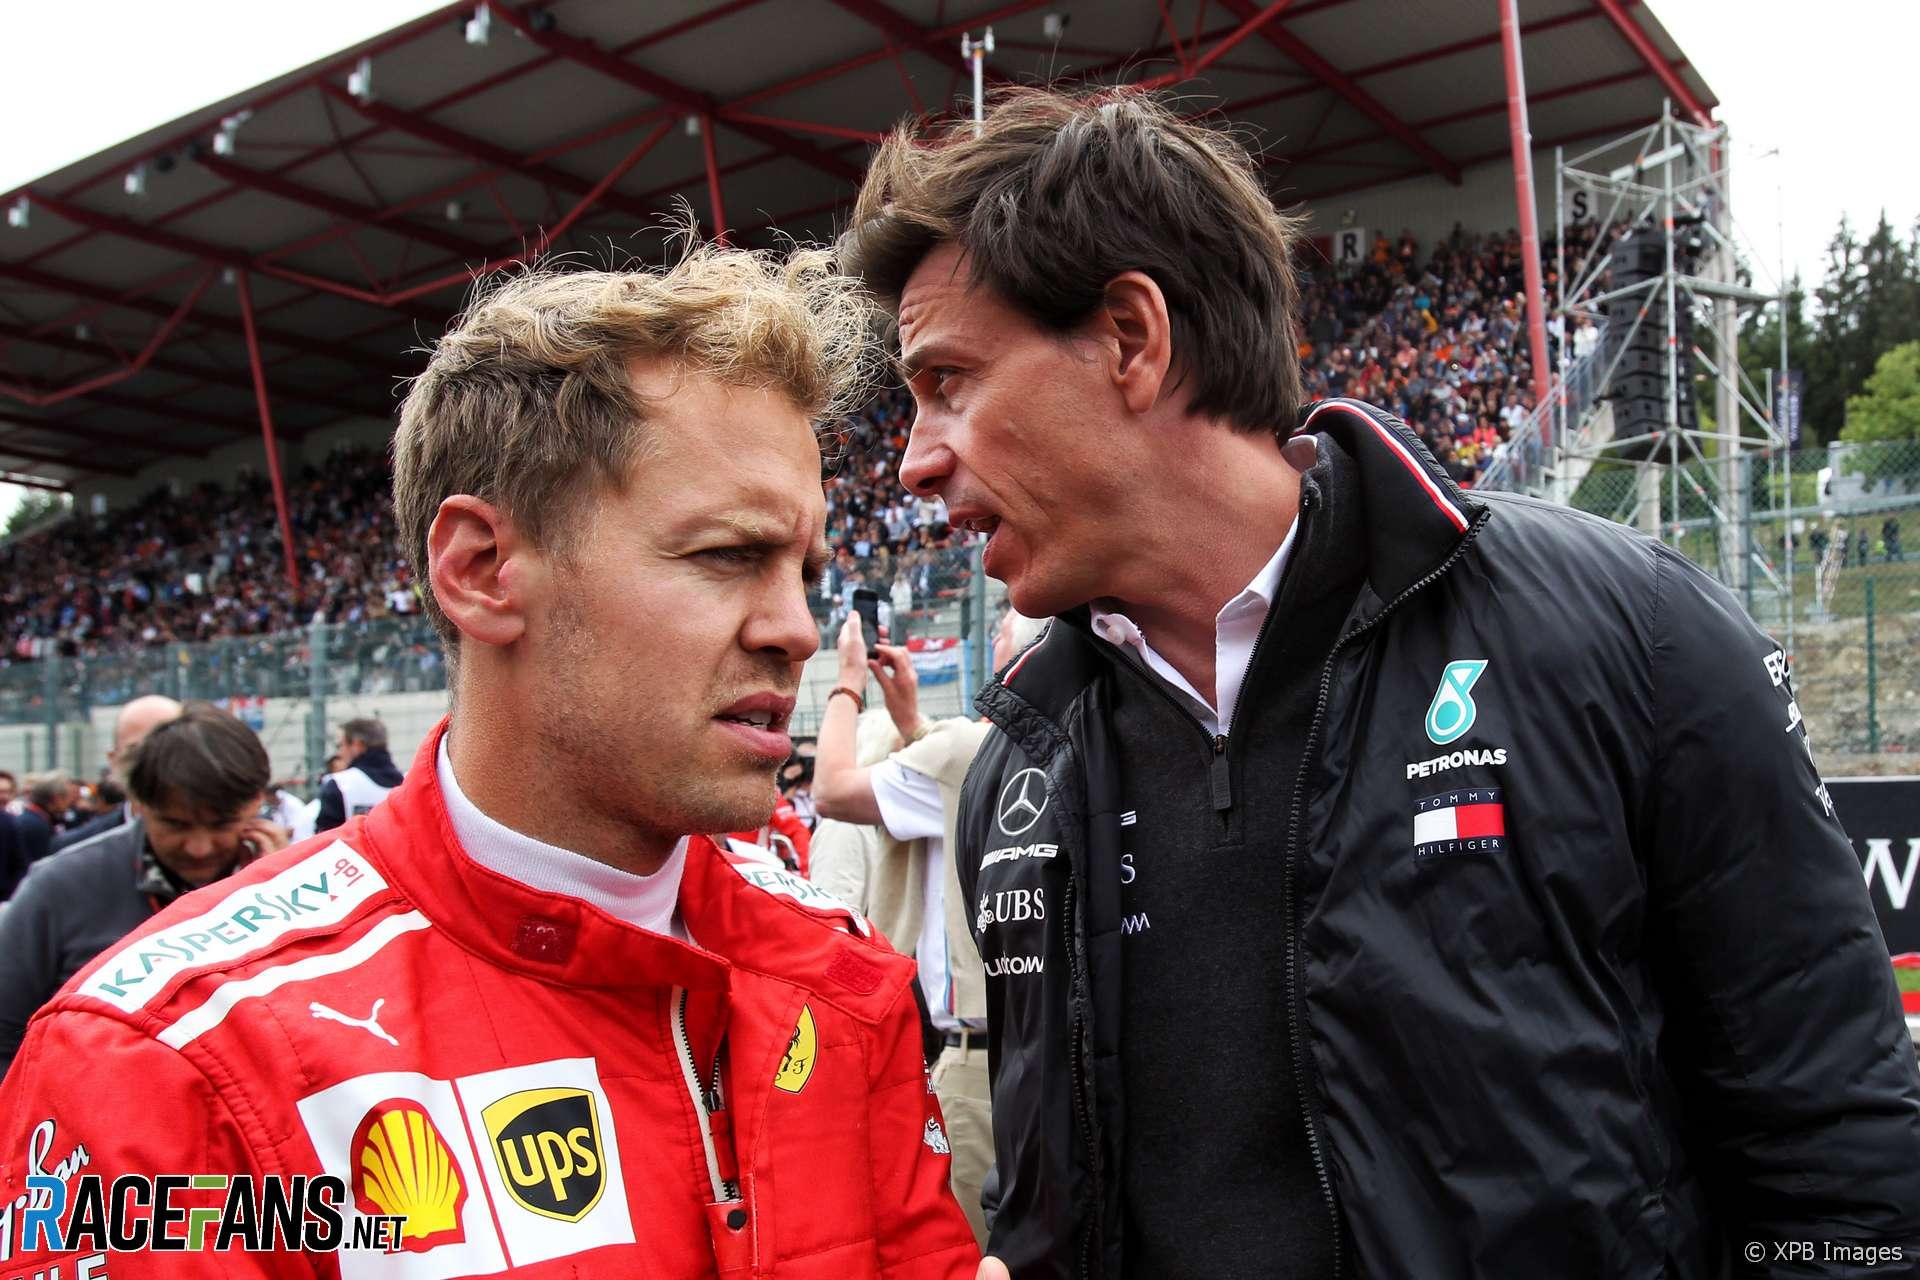 Sebastian Vettel, Toto Wolff, Spa-Francorchamps, 2018